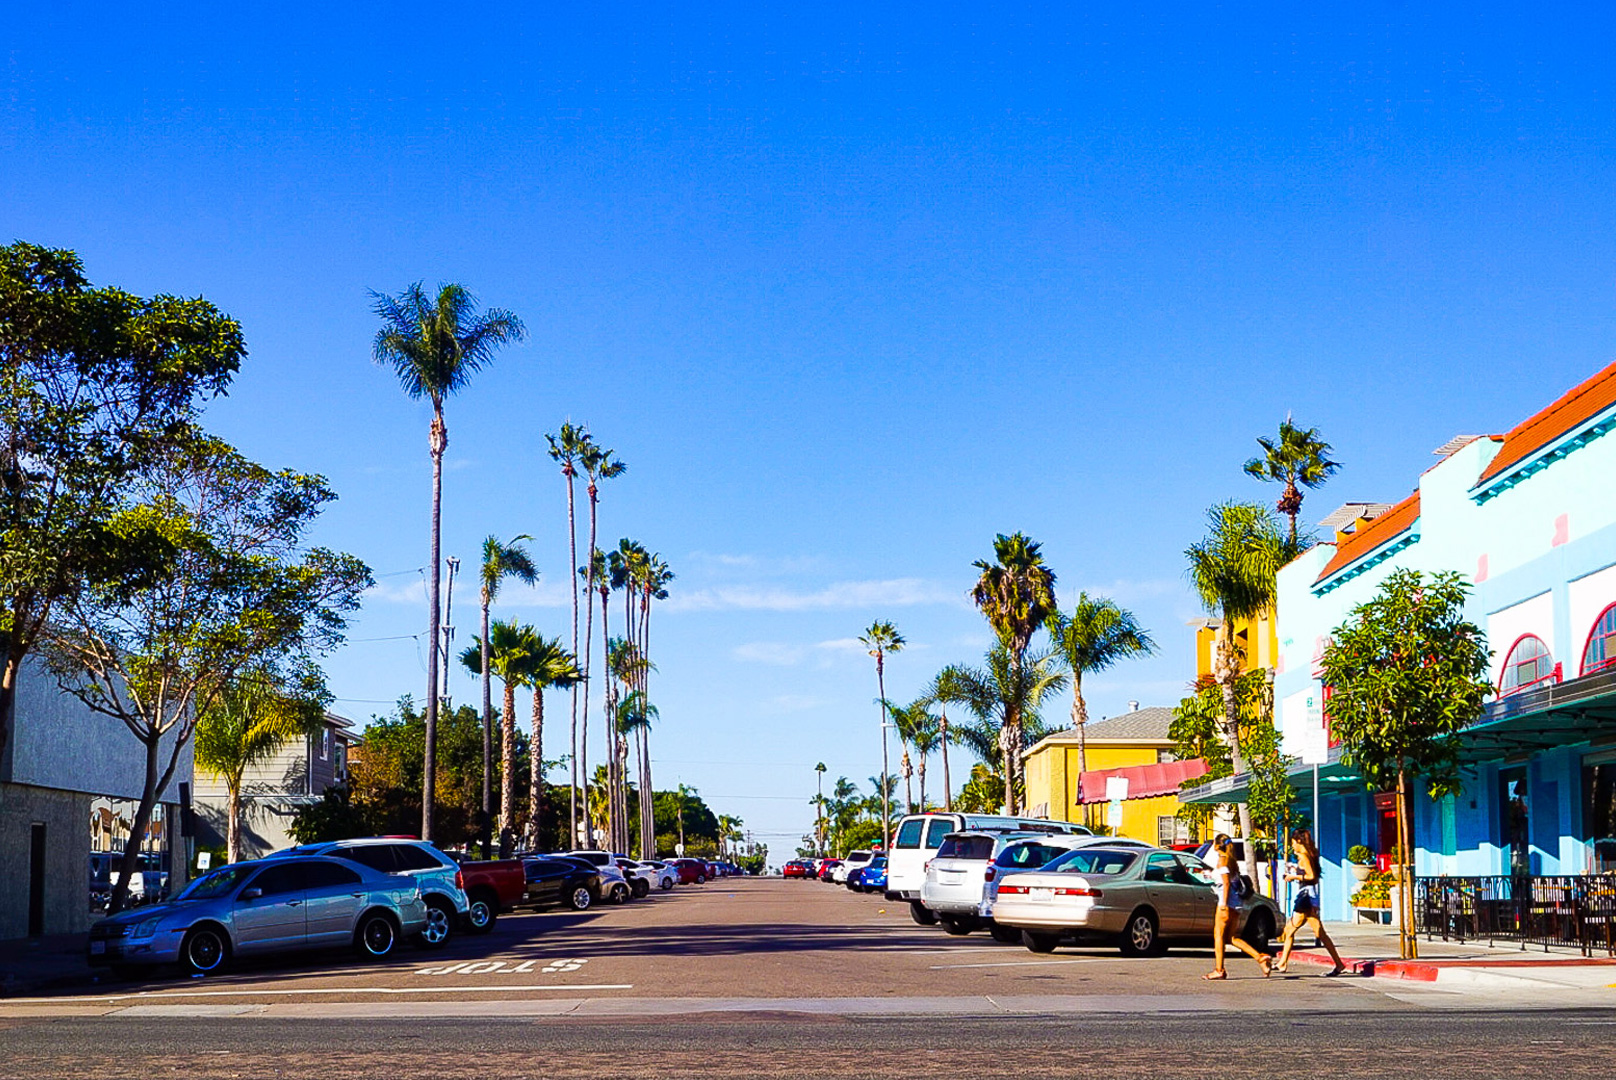 San Diego, North Park, Street